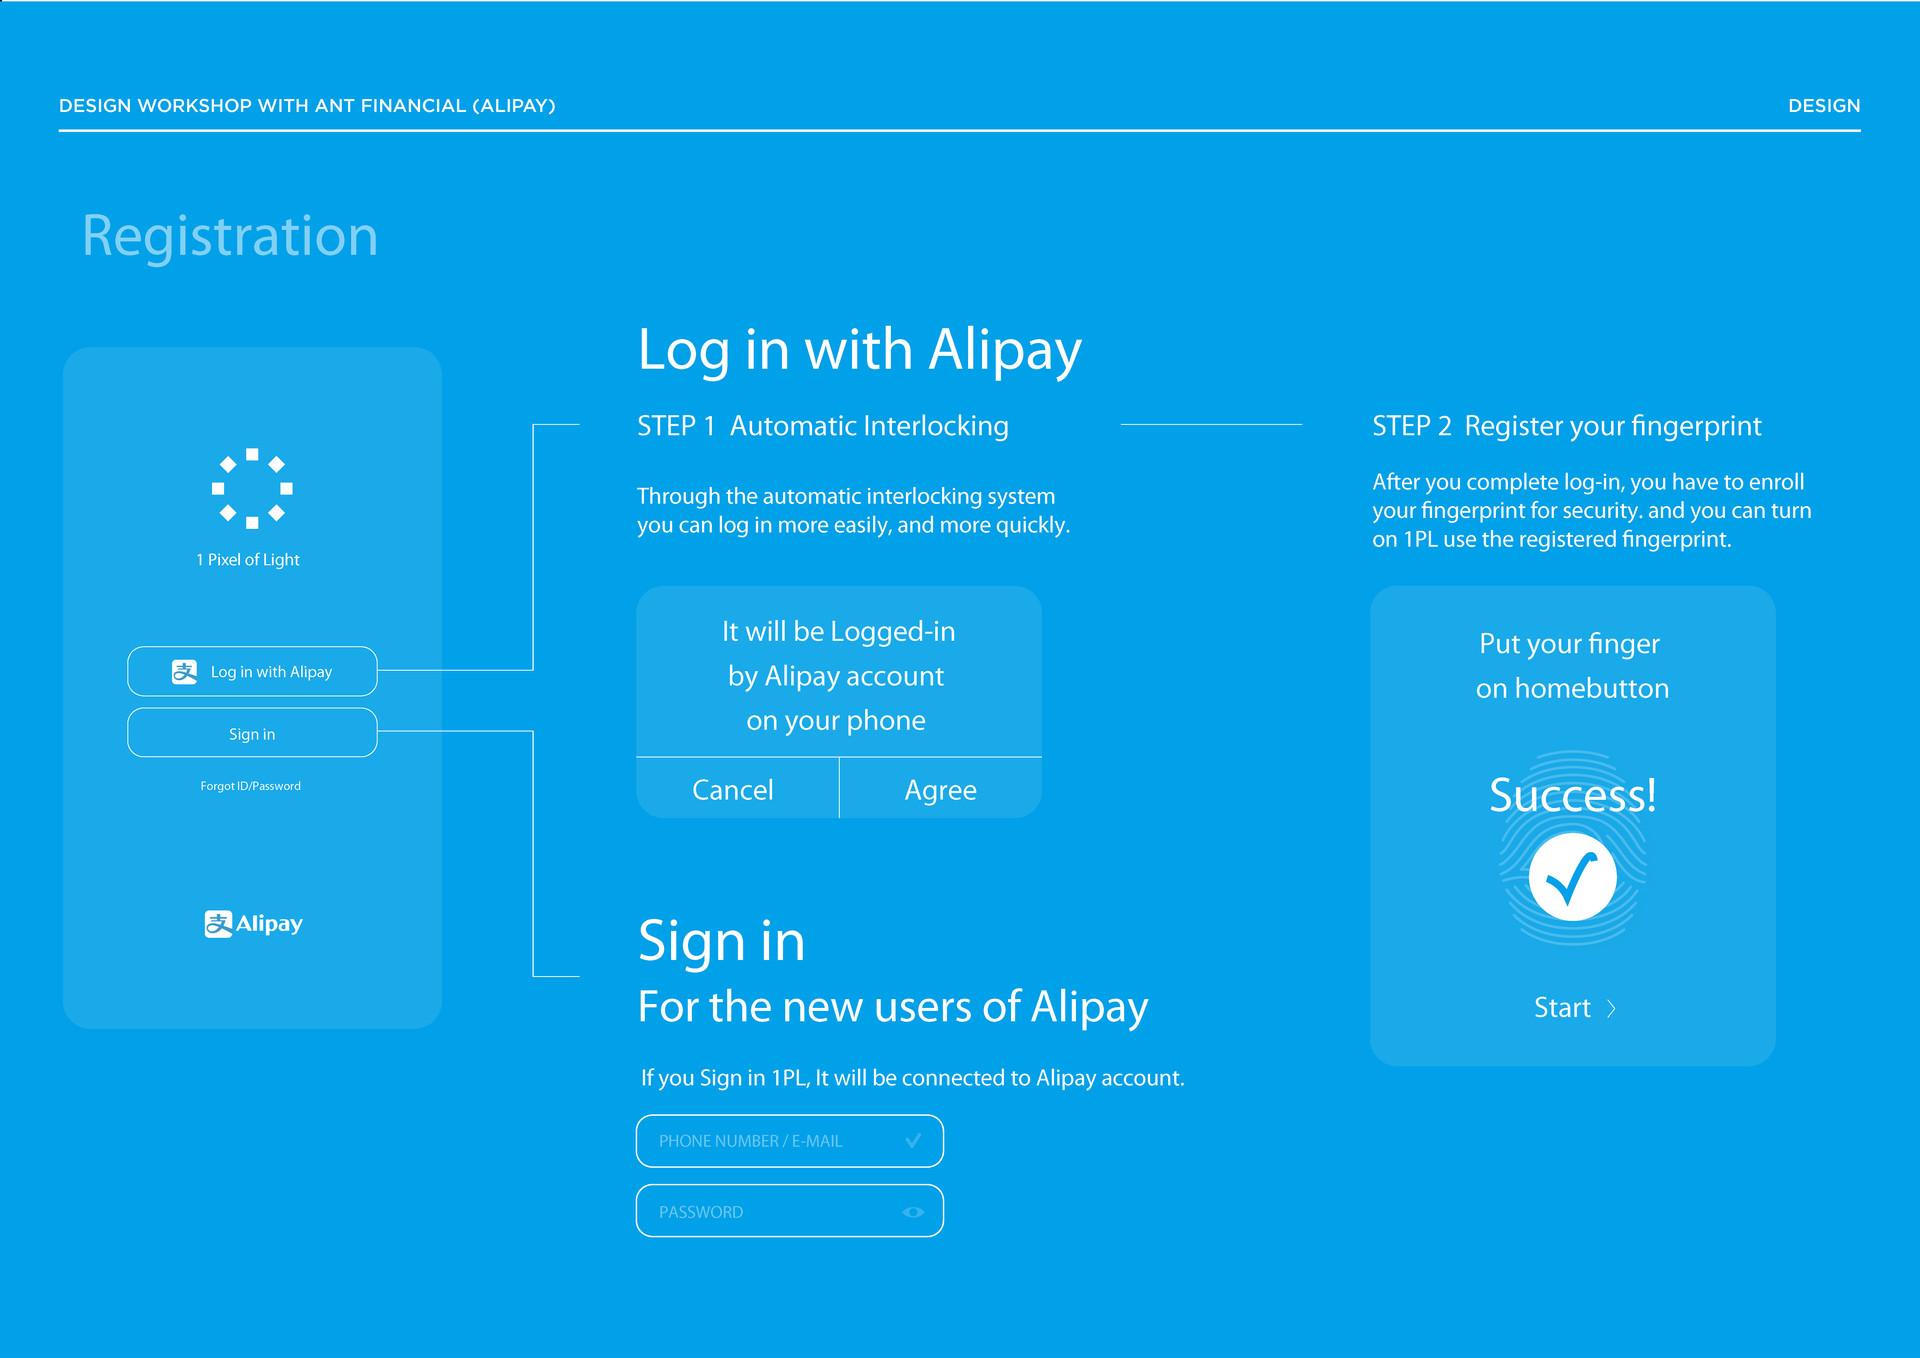 alipay_workshop_中文_페이지_32.jpg